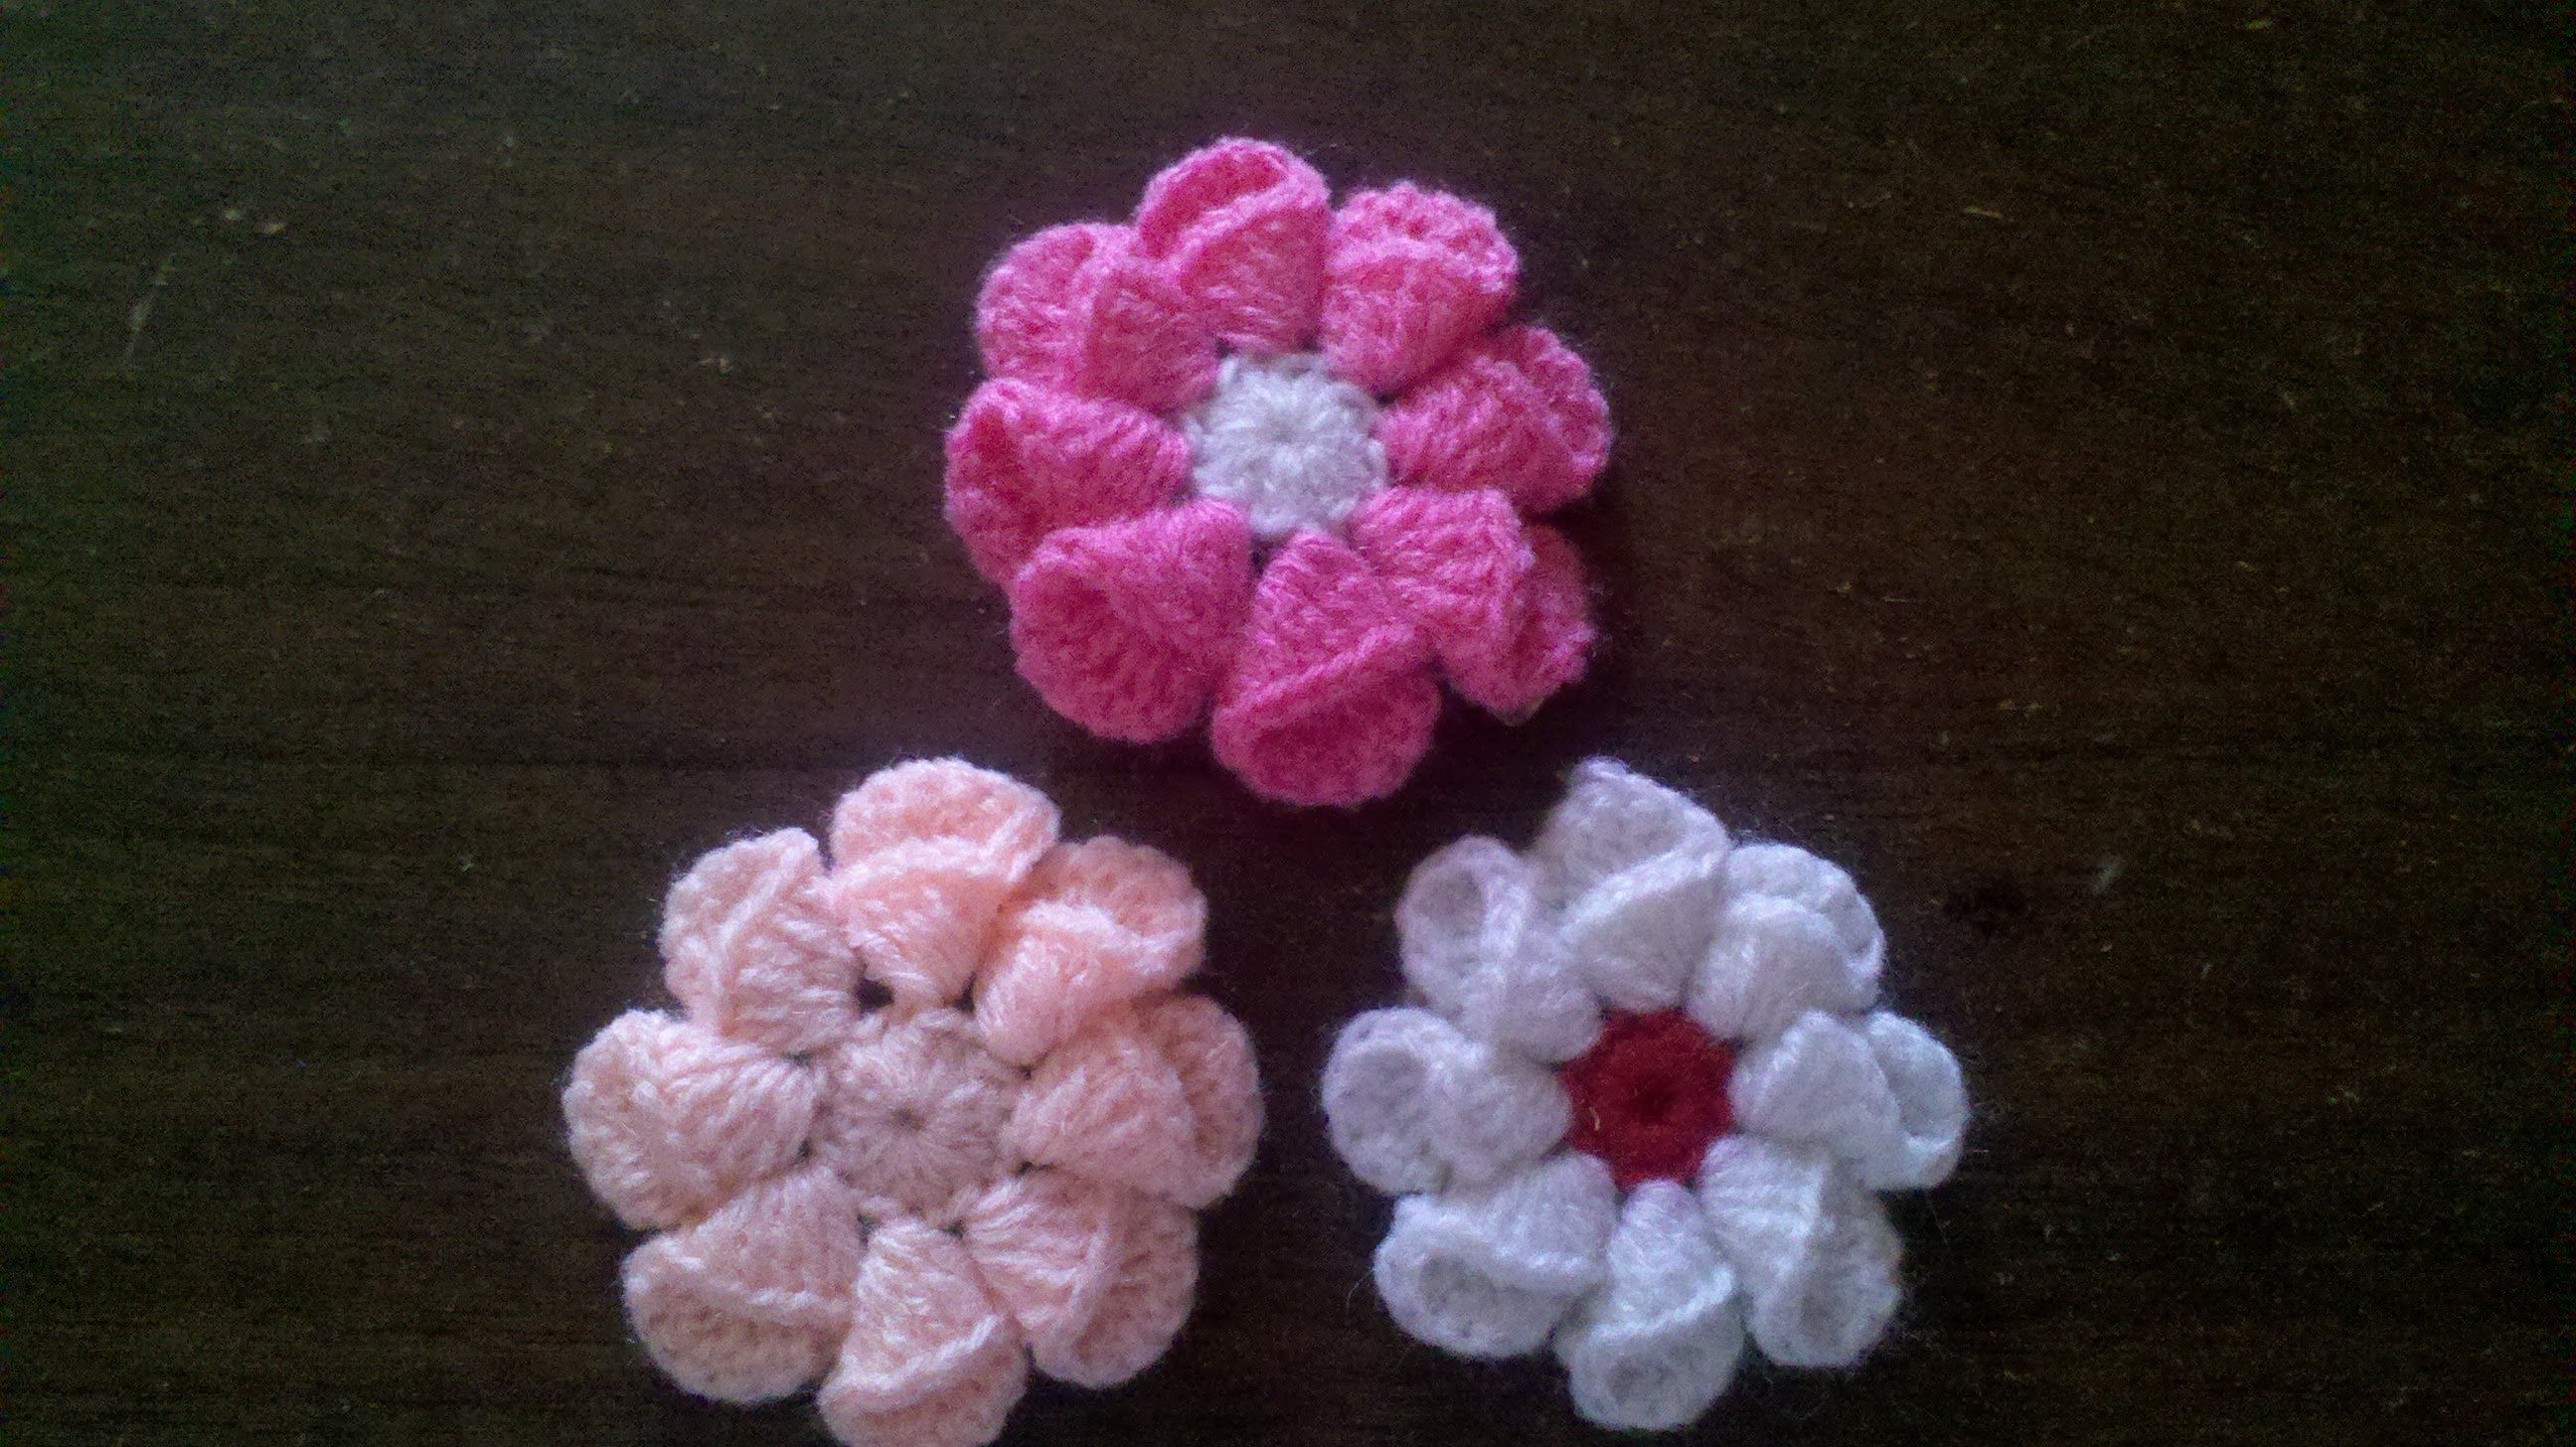 Como Hacer Una Flor Facil Y Rapido En Espaol Flores Crochet Rose Crochetflowers Pretty Flower Diagram Tutorial Crochetcrochet Videoscrochet Flowerscrochet